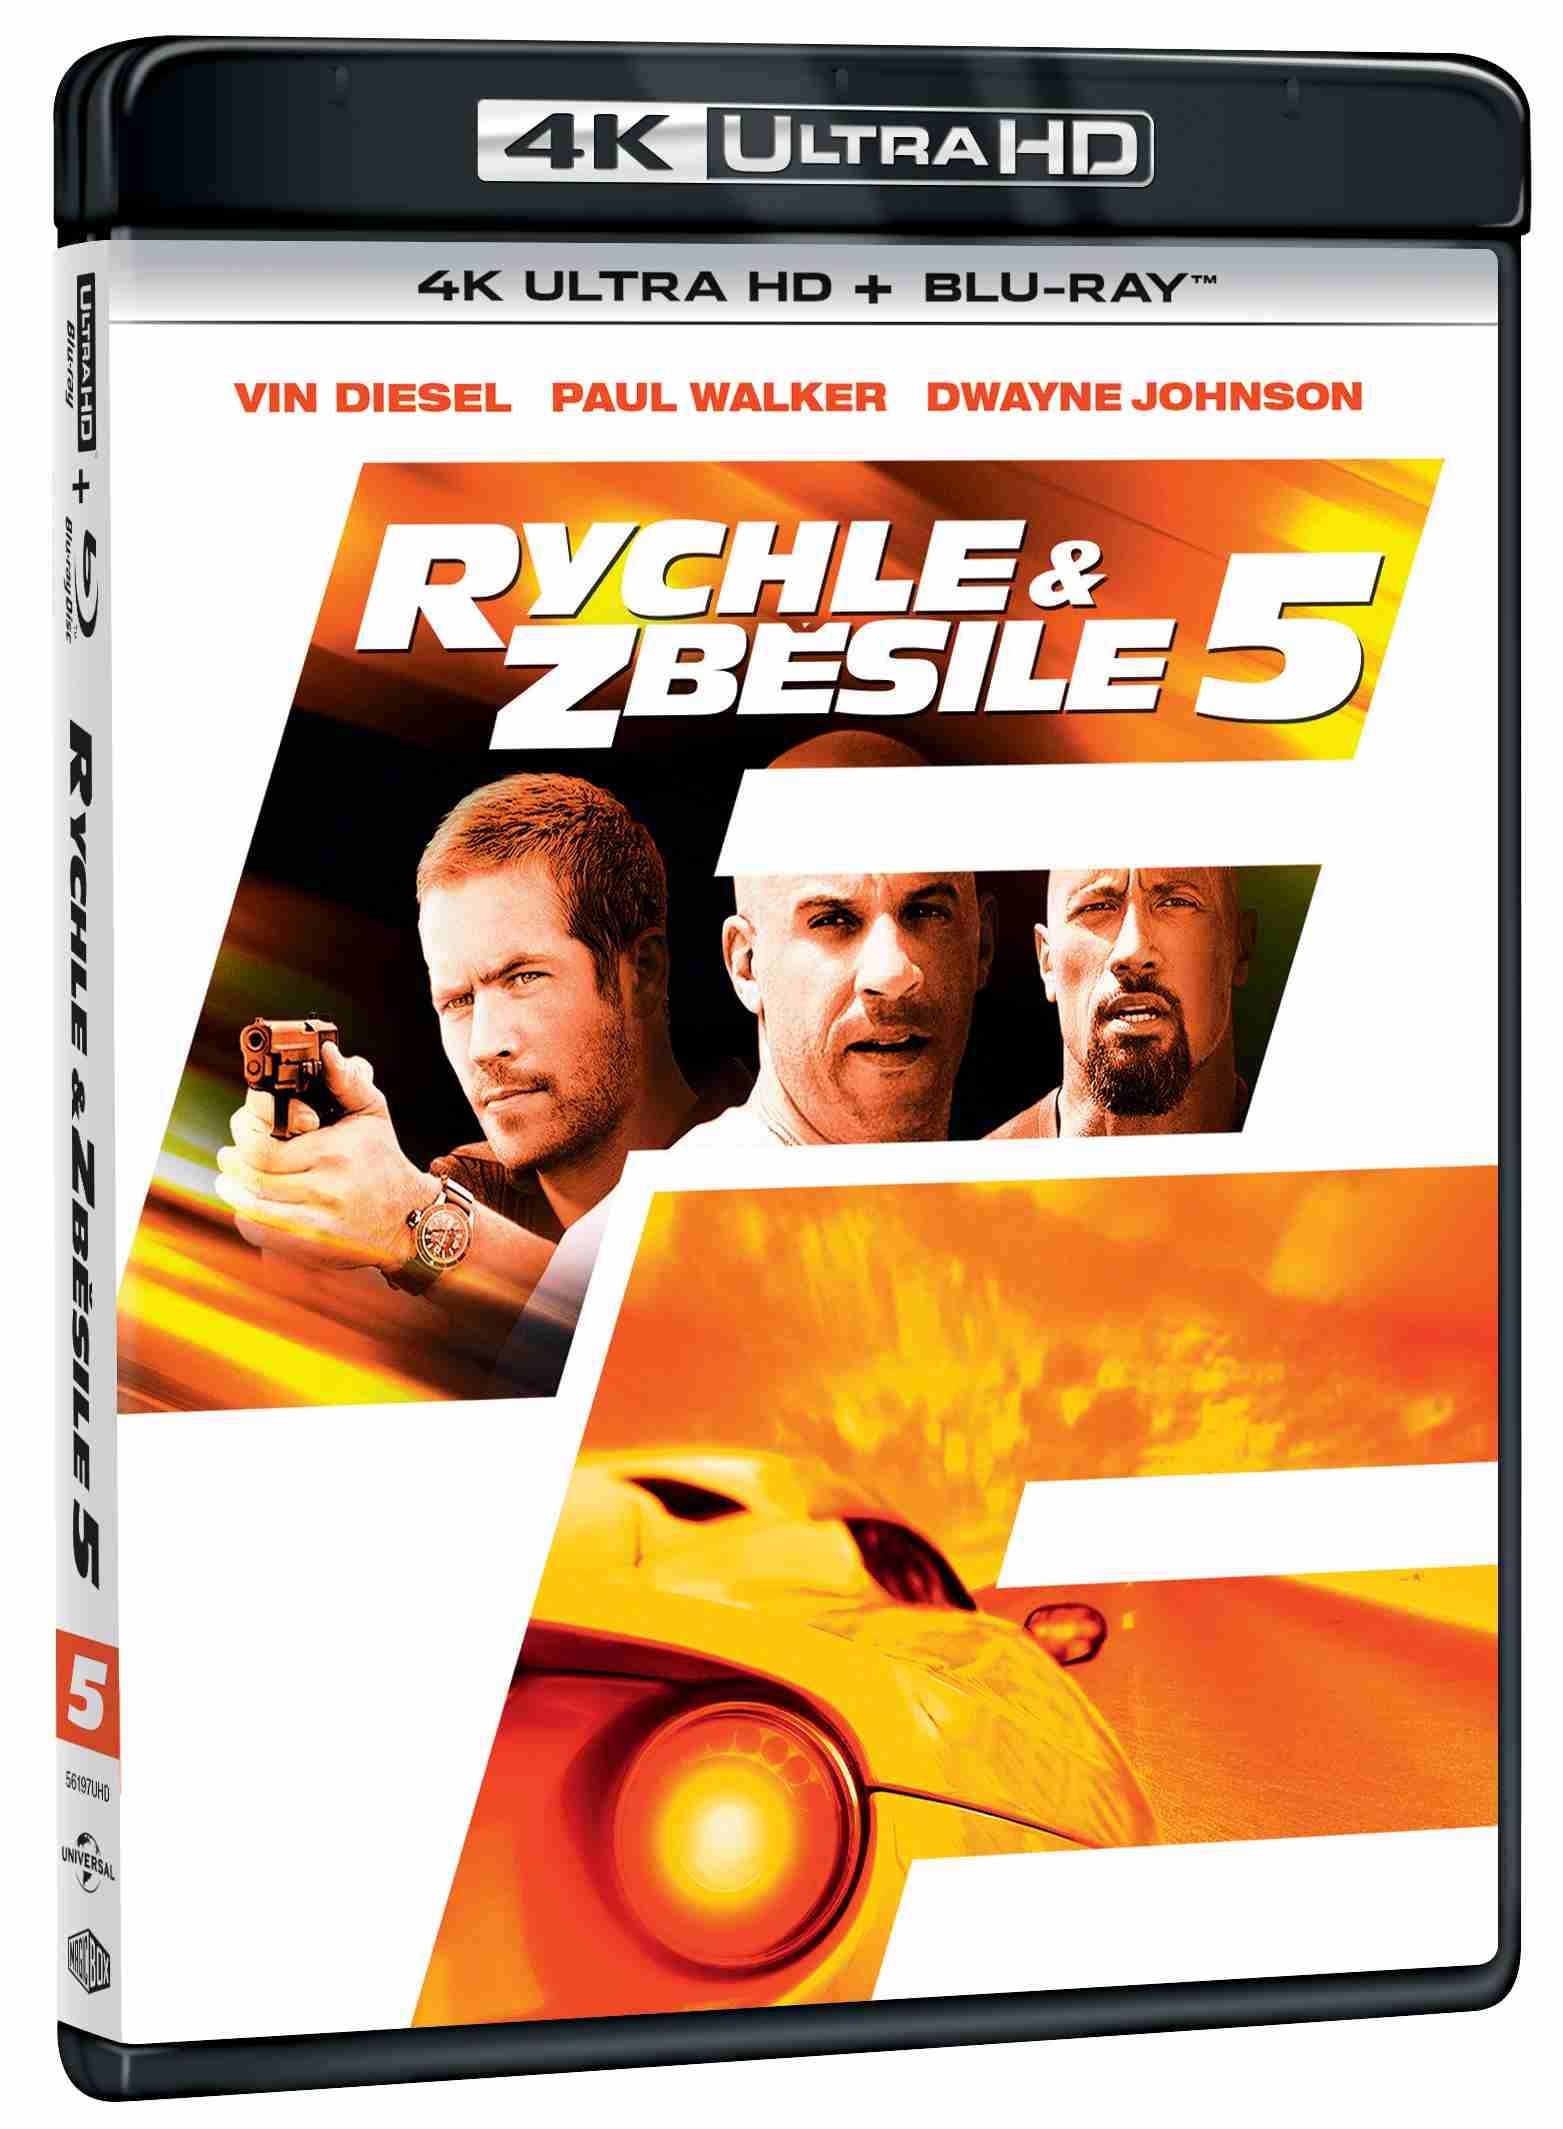 Rychle a zběsile 5 (4K Ultra HD Blu-ray + Blu-ray (2 BD)